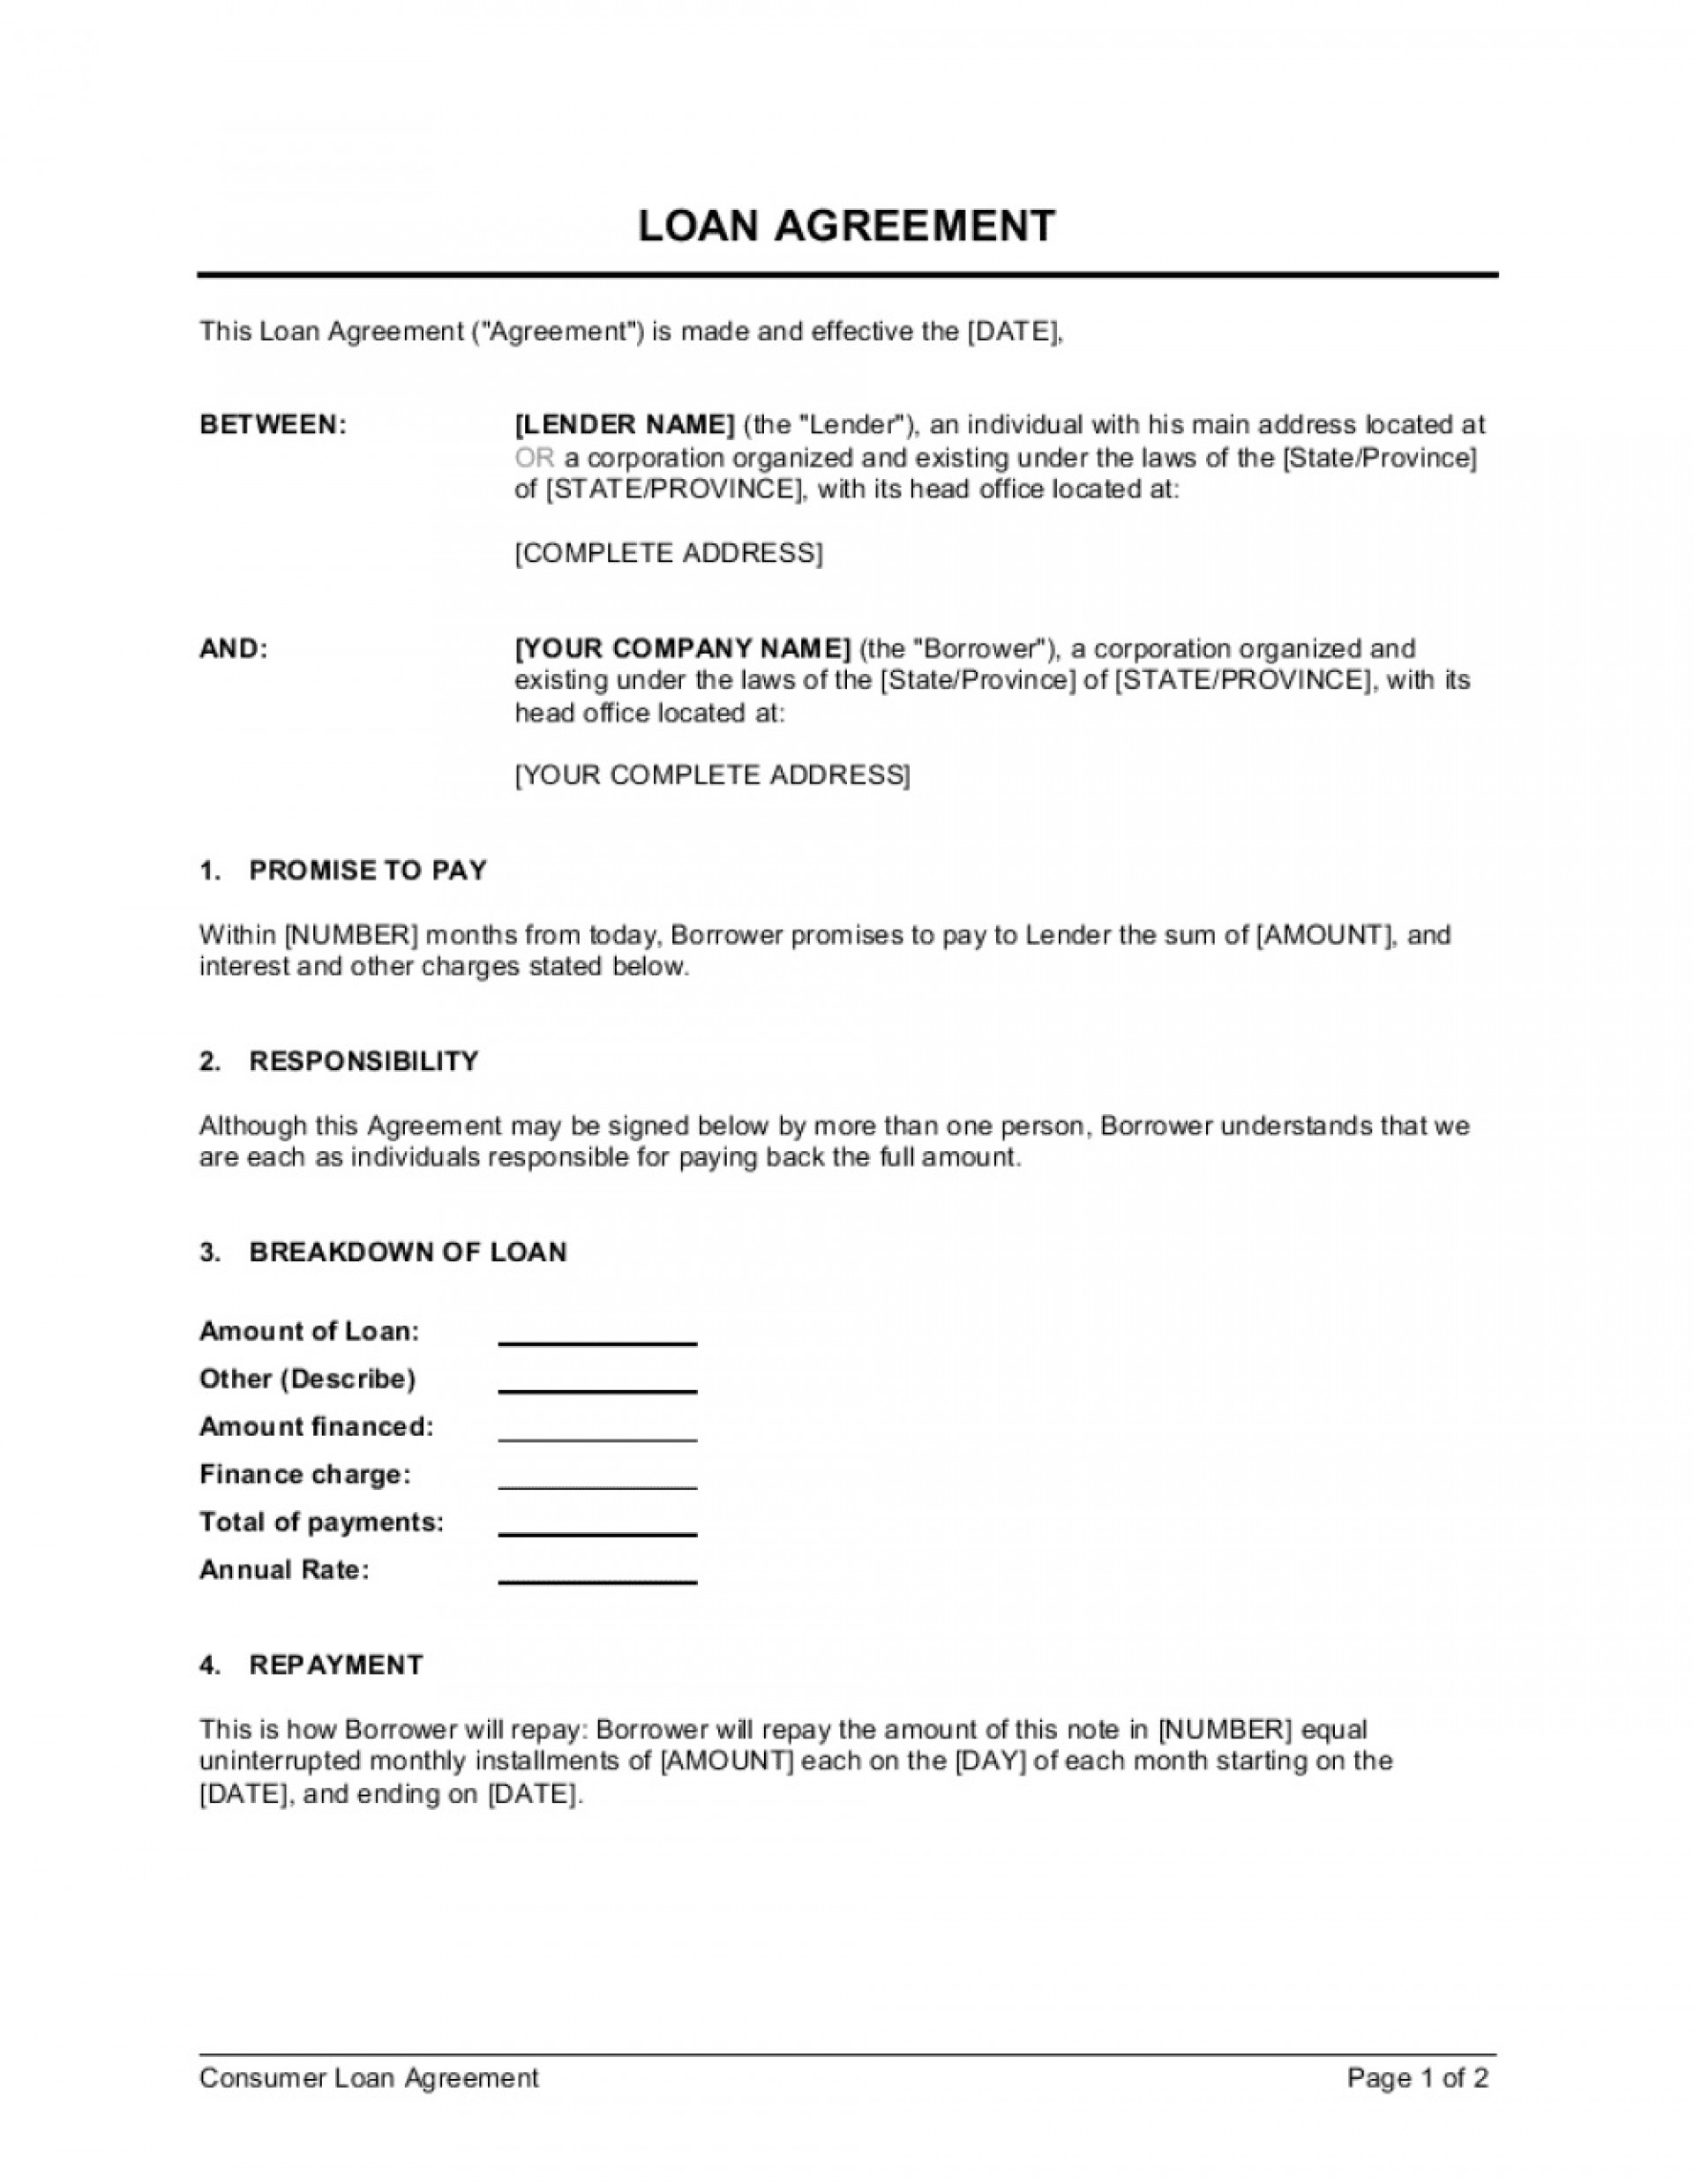 004 Singular Loan Agreement Template Free Photo  Word Nz Family Uk1920